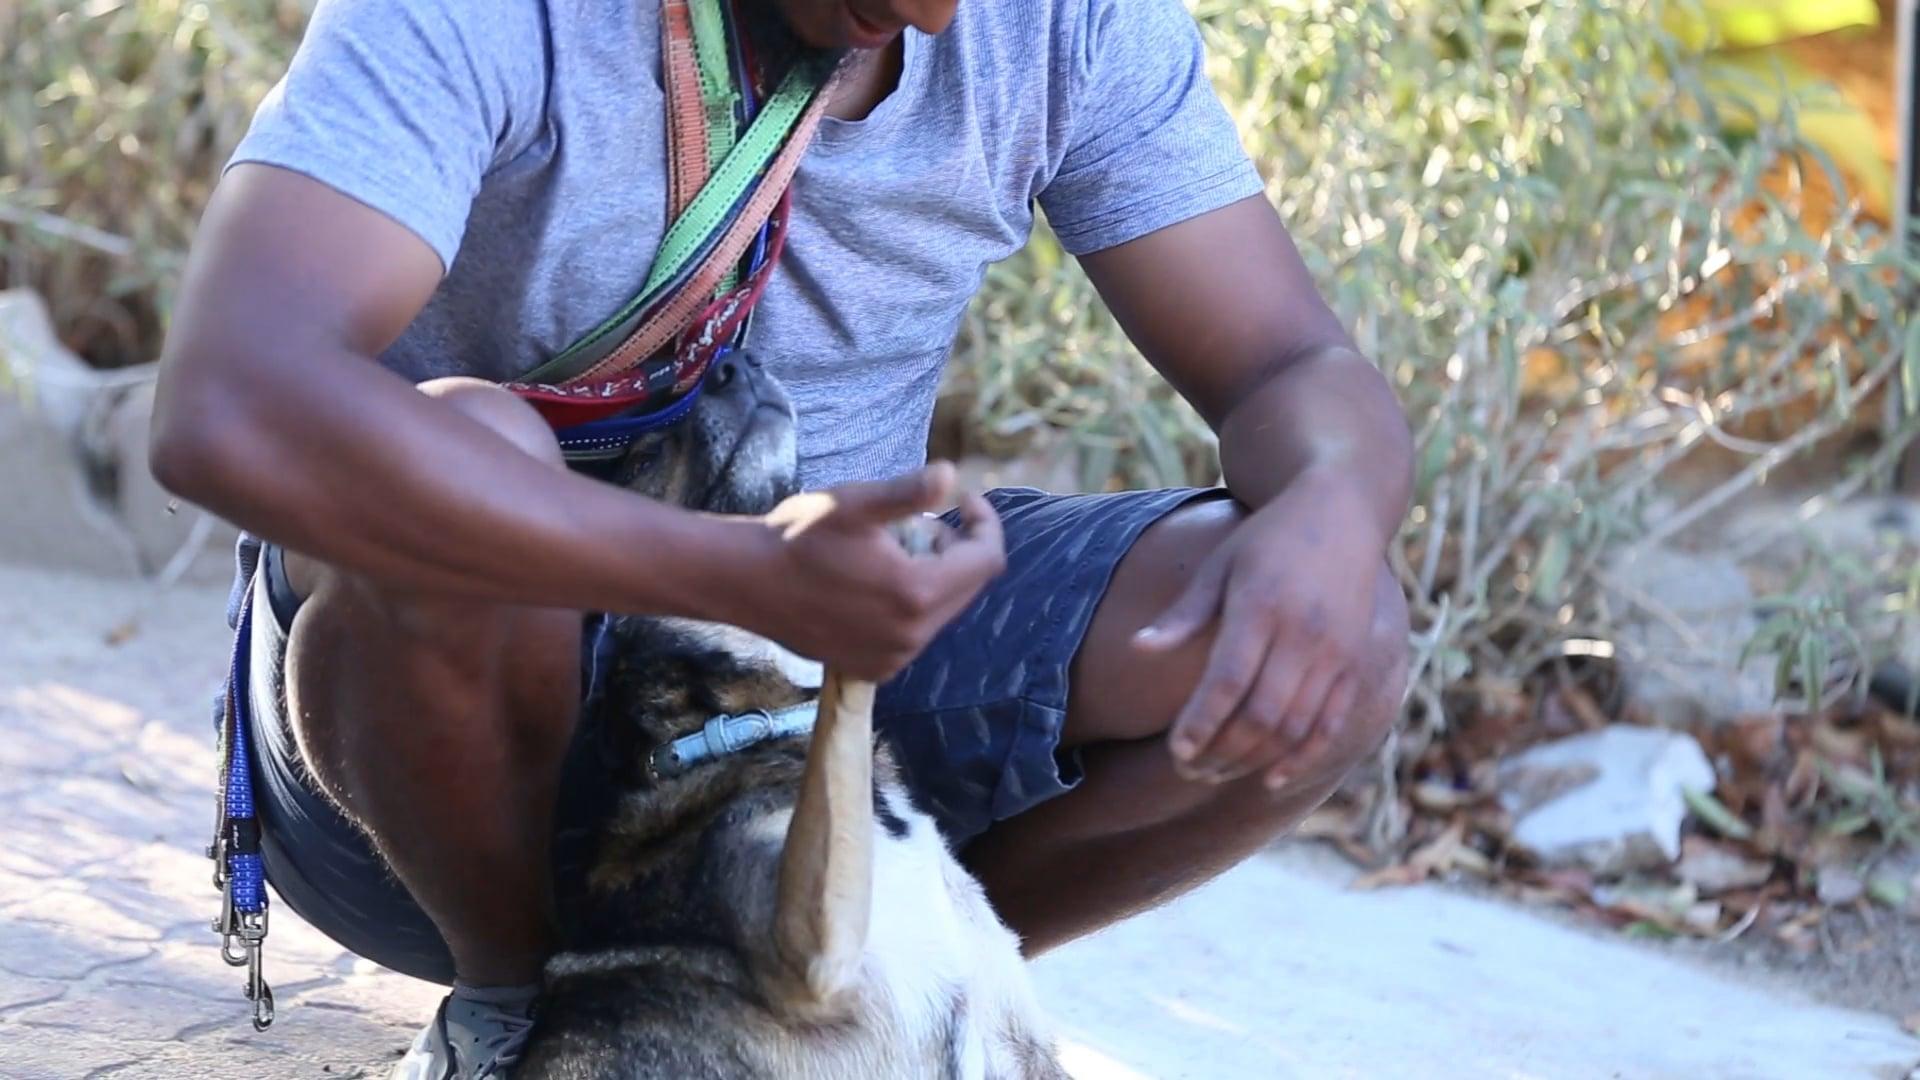 Flower Power Braktrap, Animal Welfare Society Stellenbosch - 25 February 2018